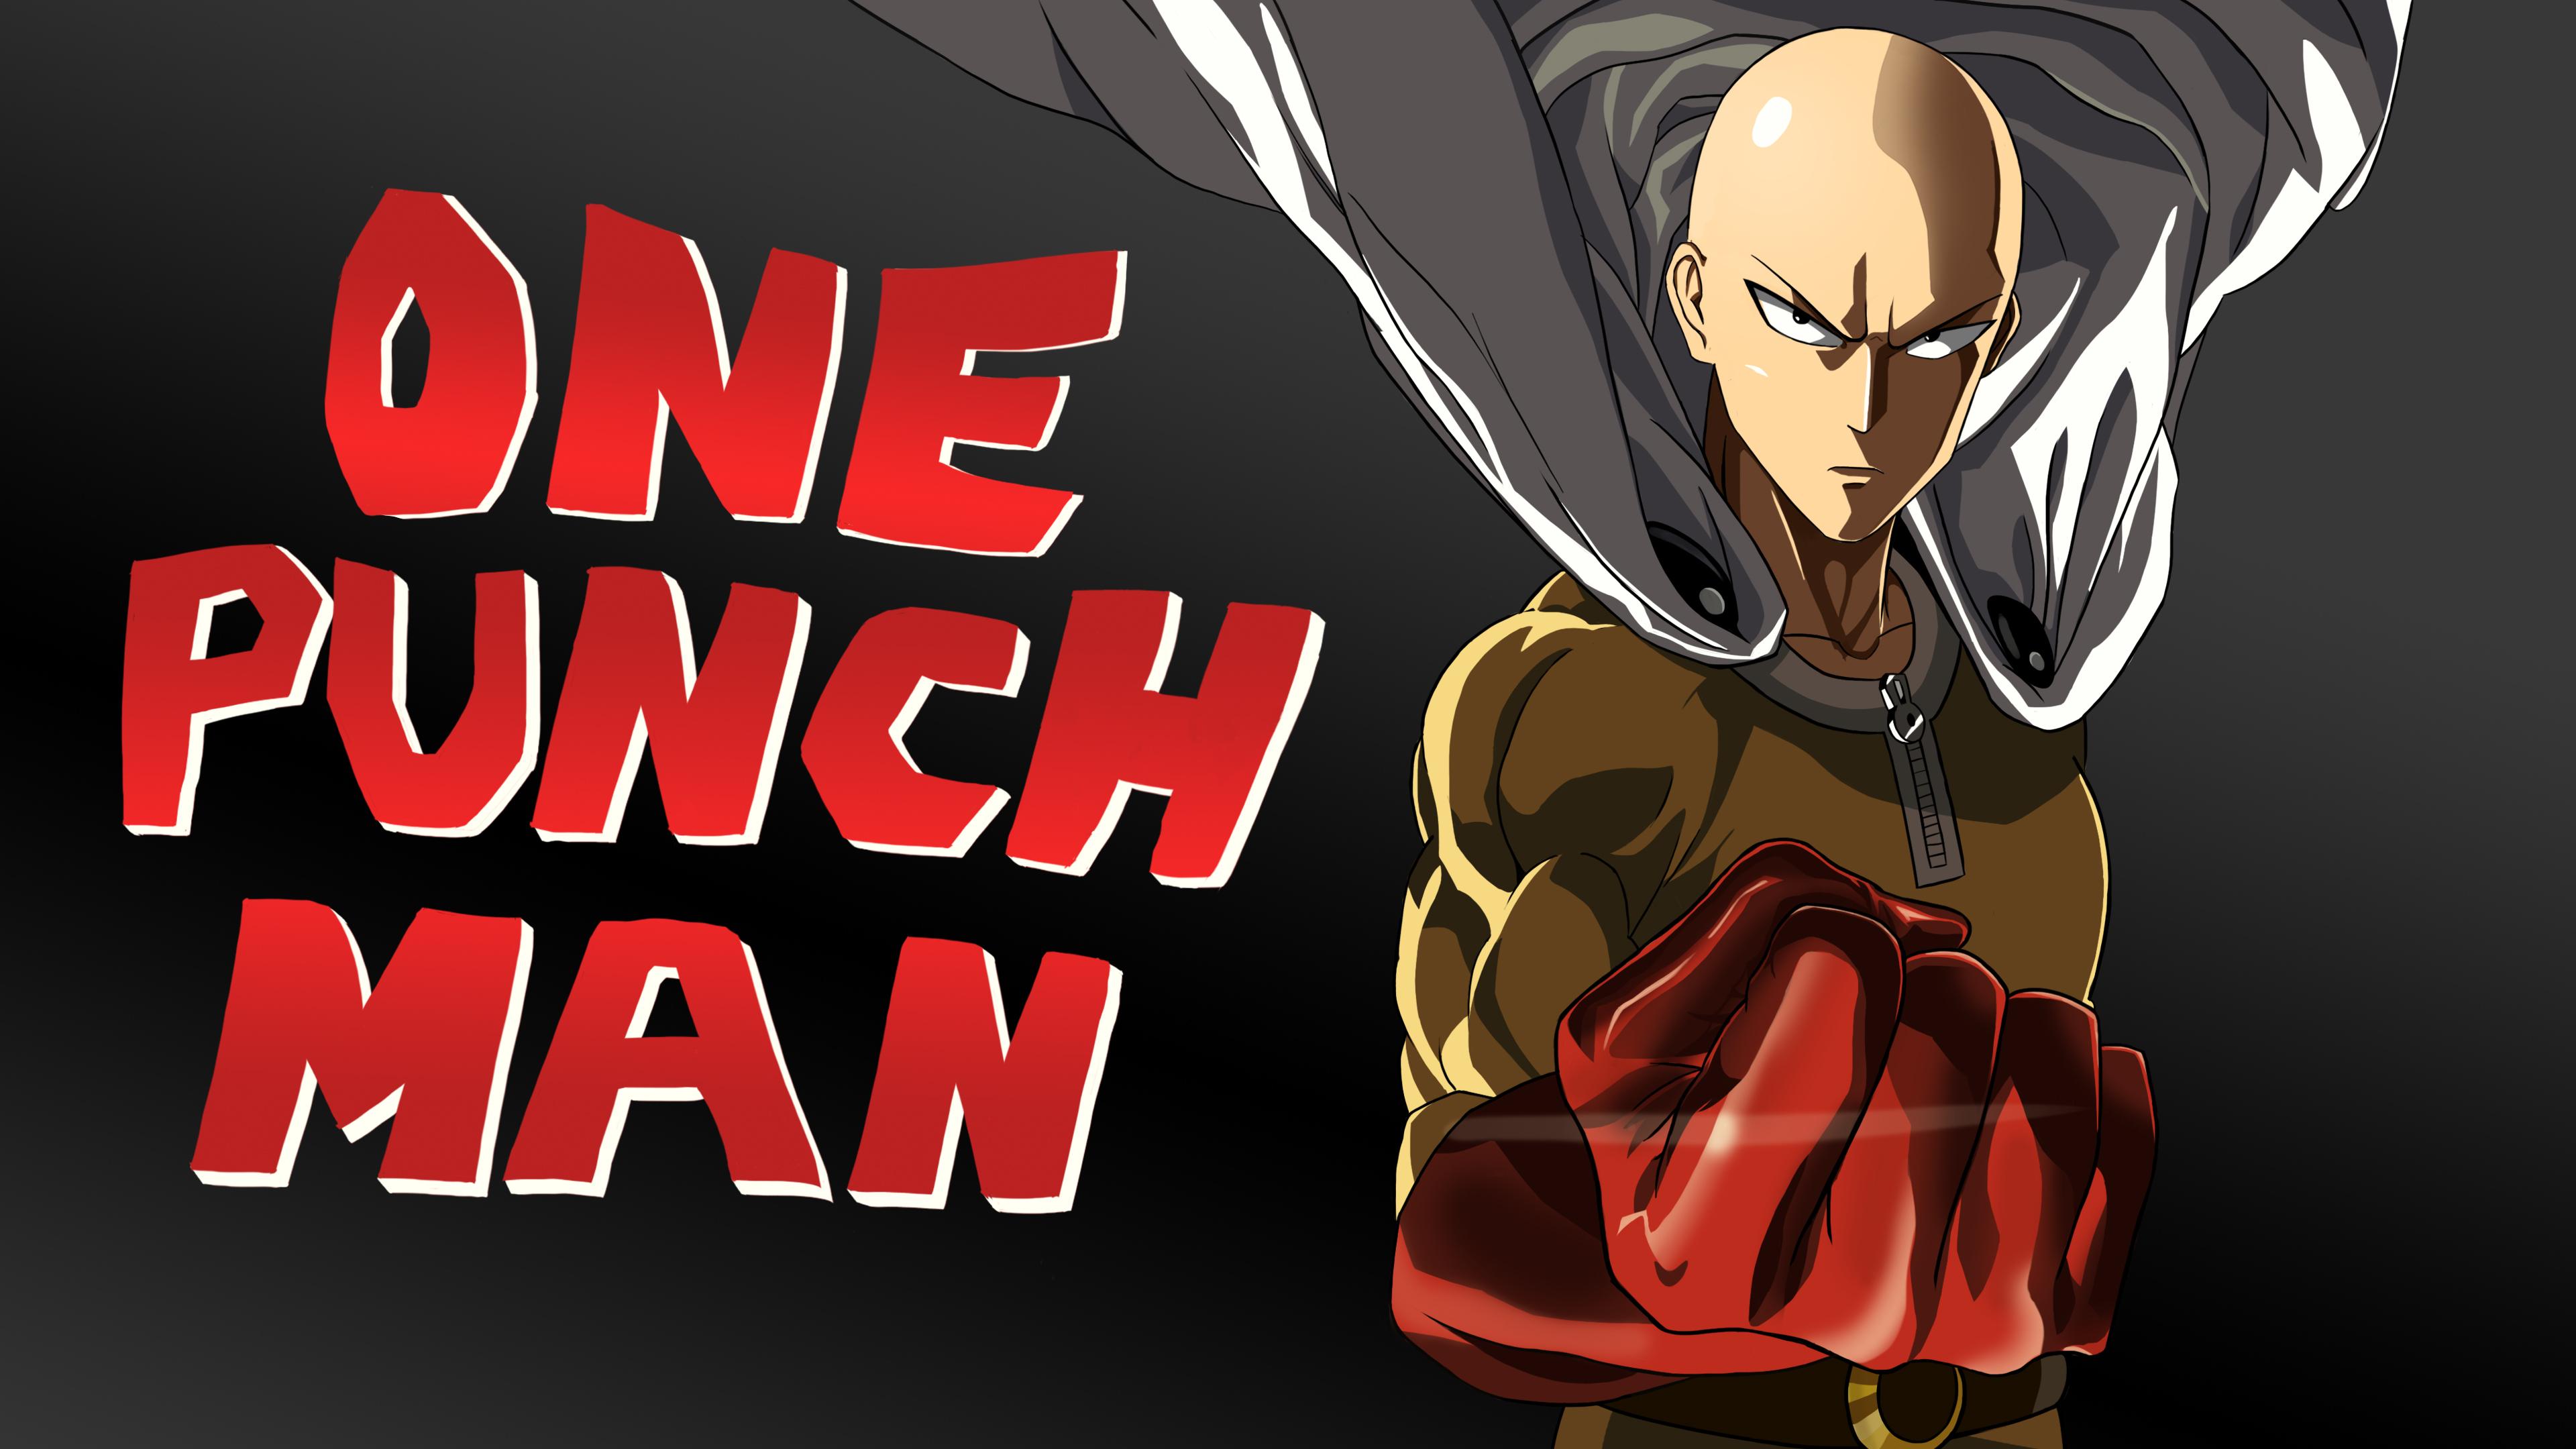 Anime 3840x2160 anime anime boys One-Punch Man artwork Saitama superhero dark background